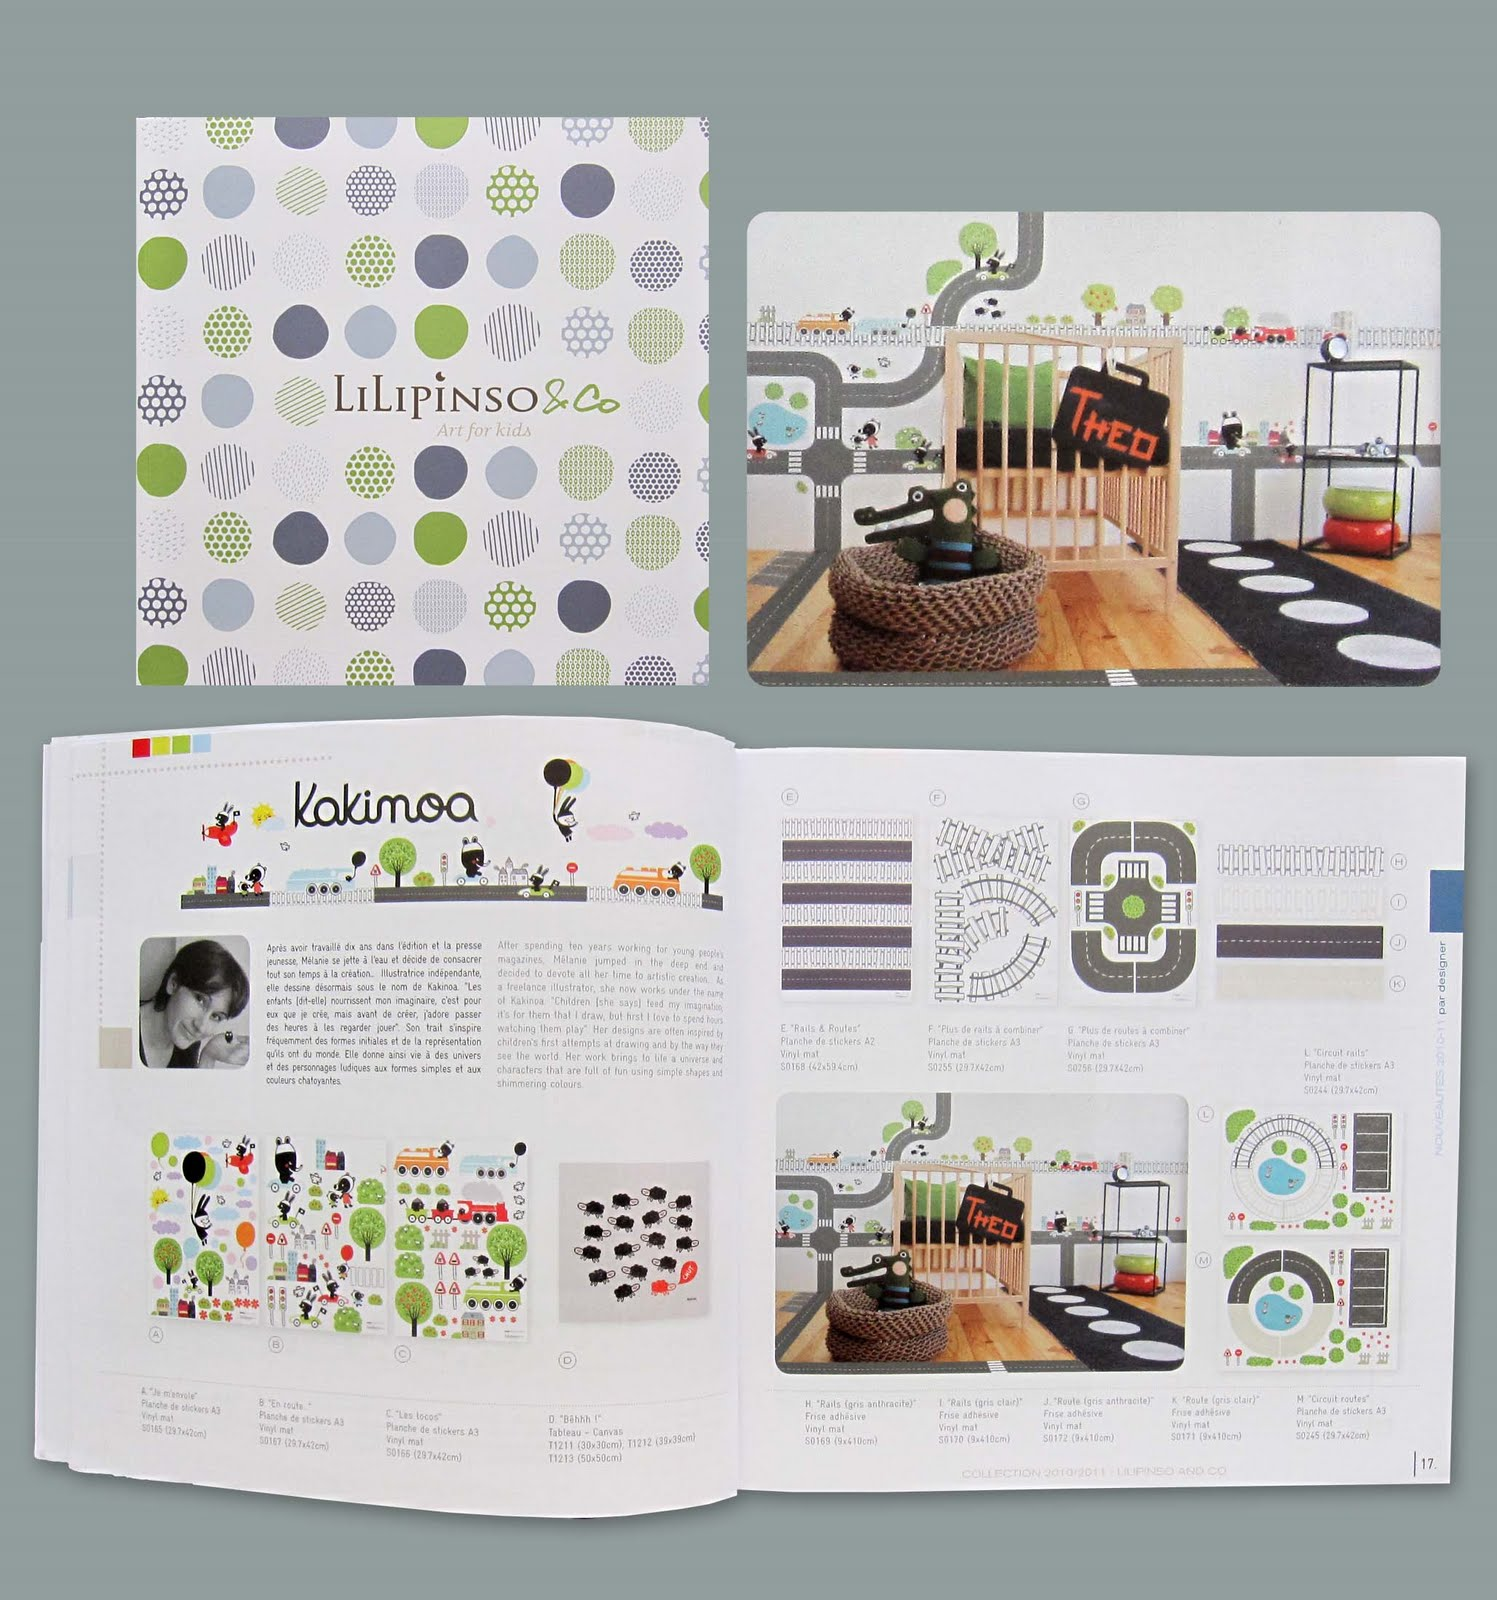 kakinoa septembre 2010. Black Bedroom Furniture Sets. Home Design Ideas